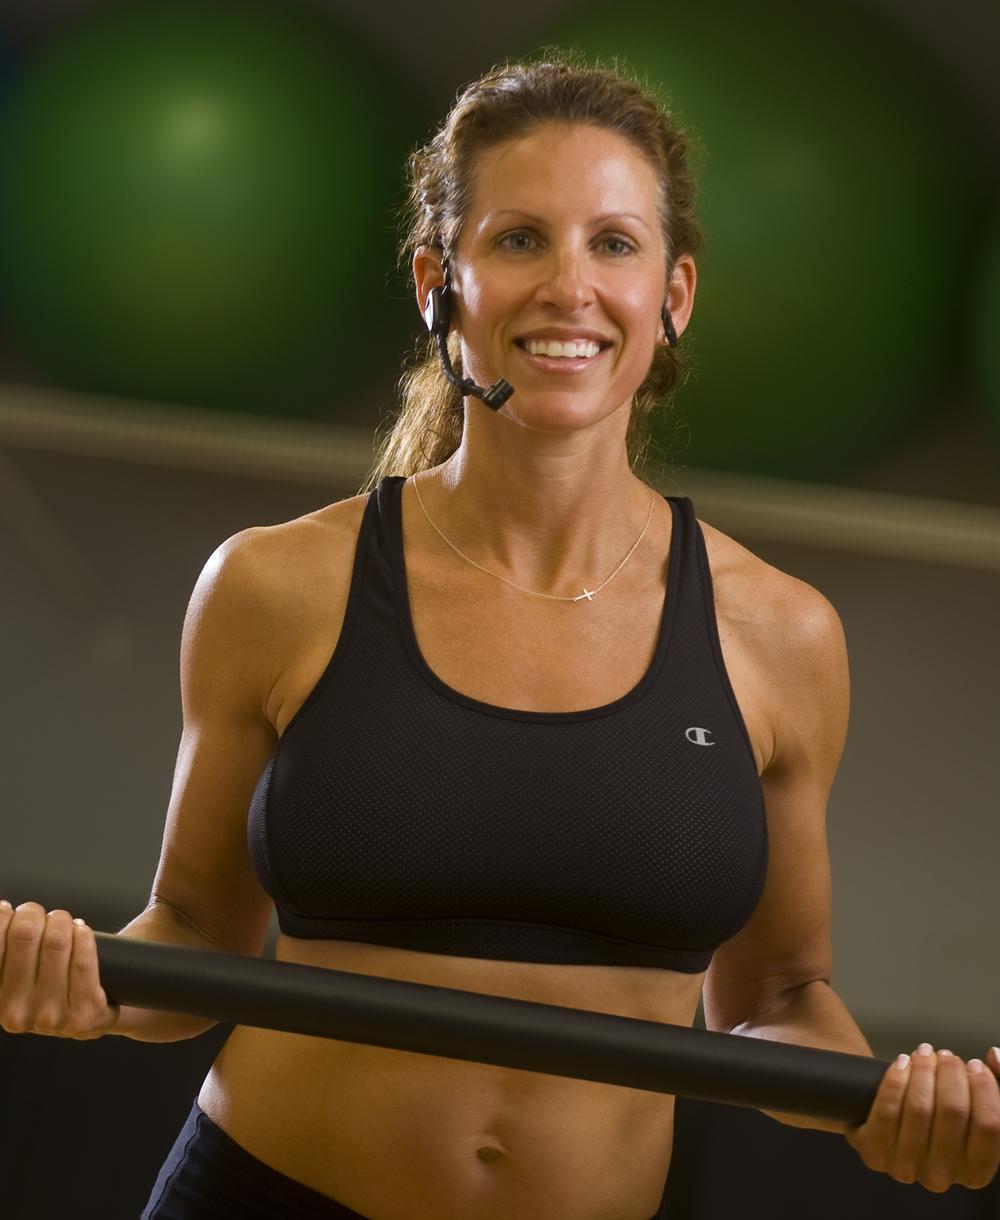 Dana Taylor - Trainer